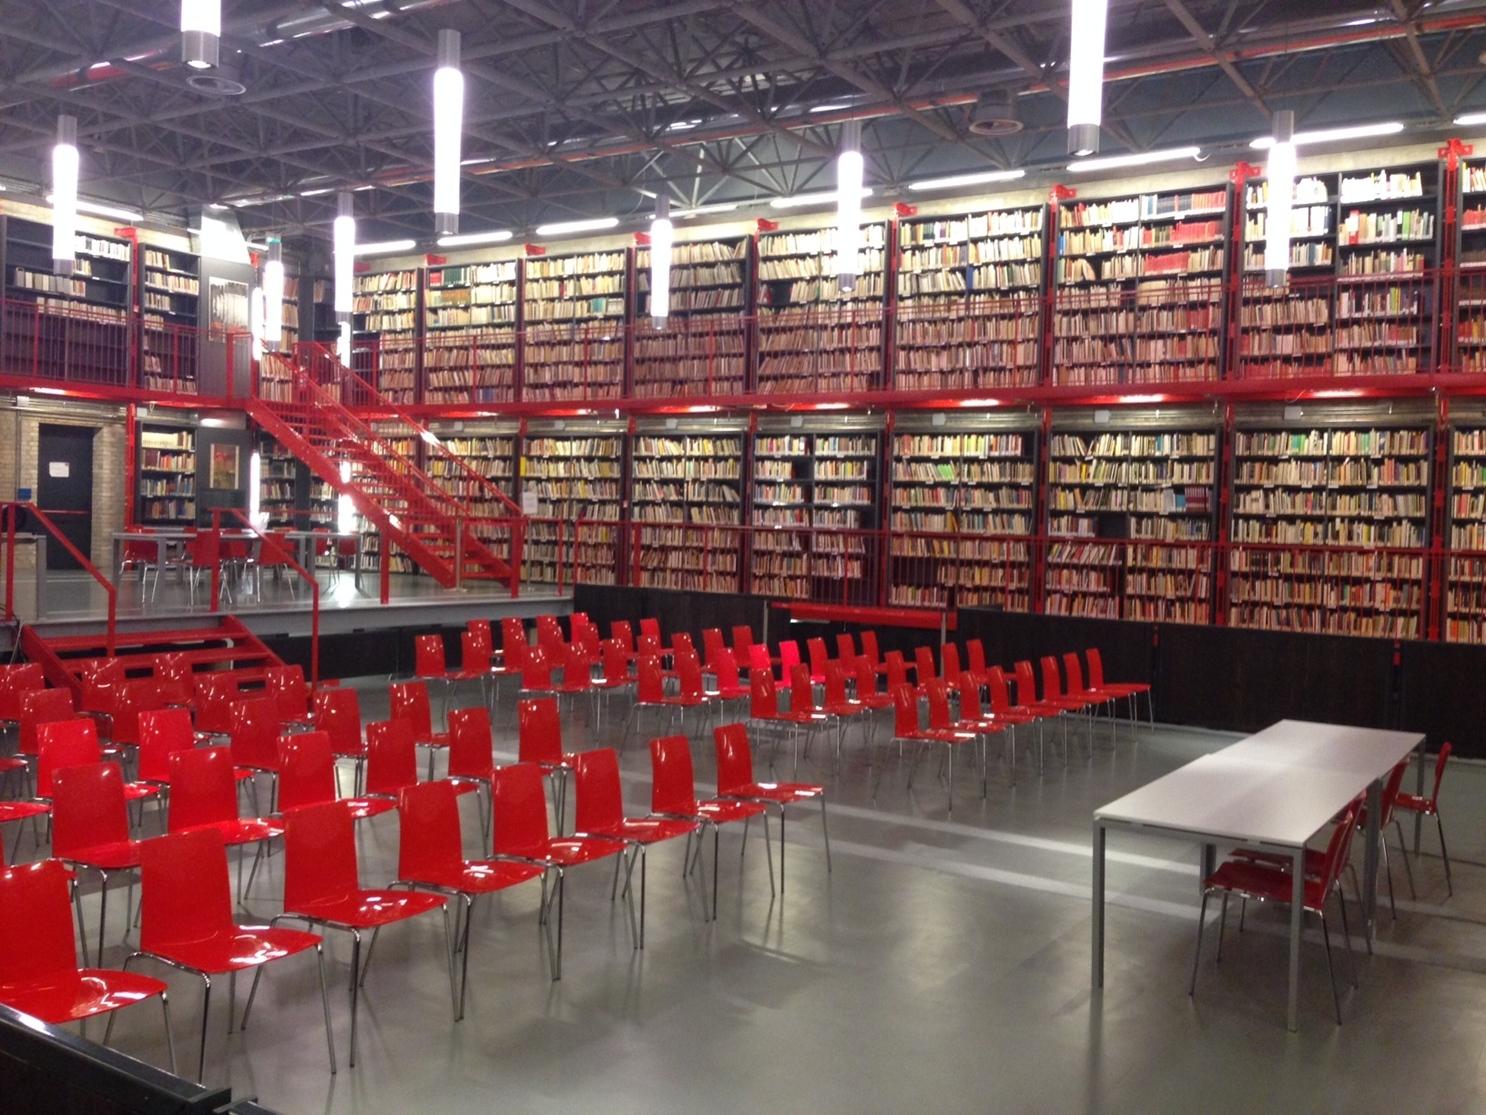 Biblioteca della Biennale di Venezia - ASAC